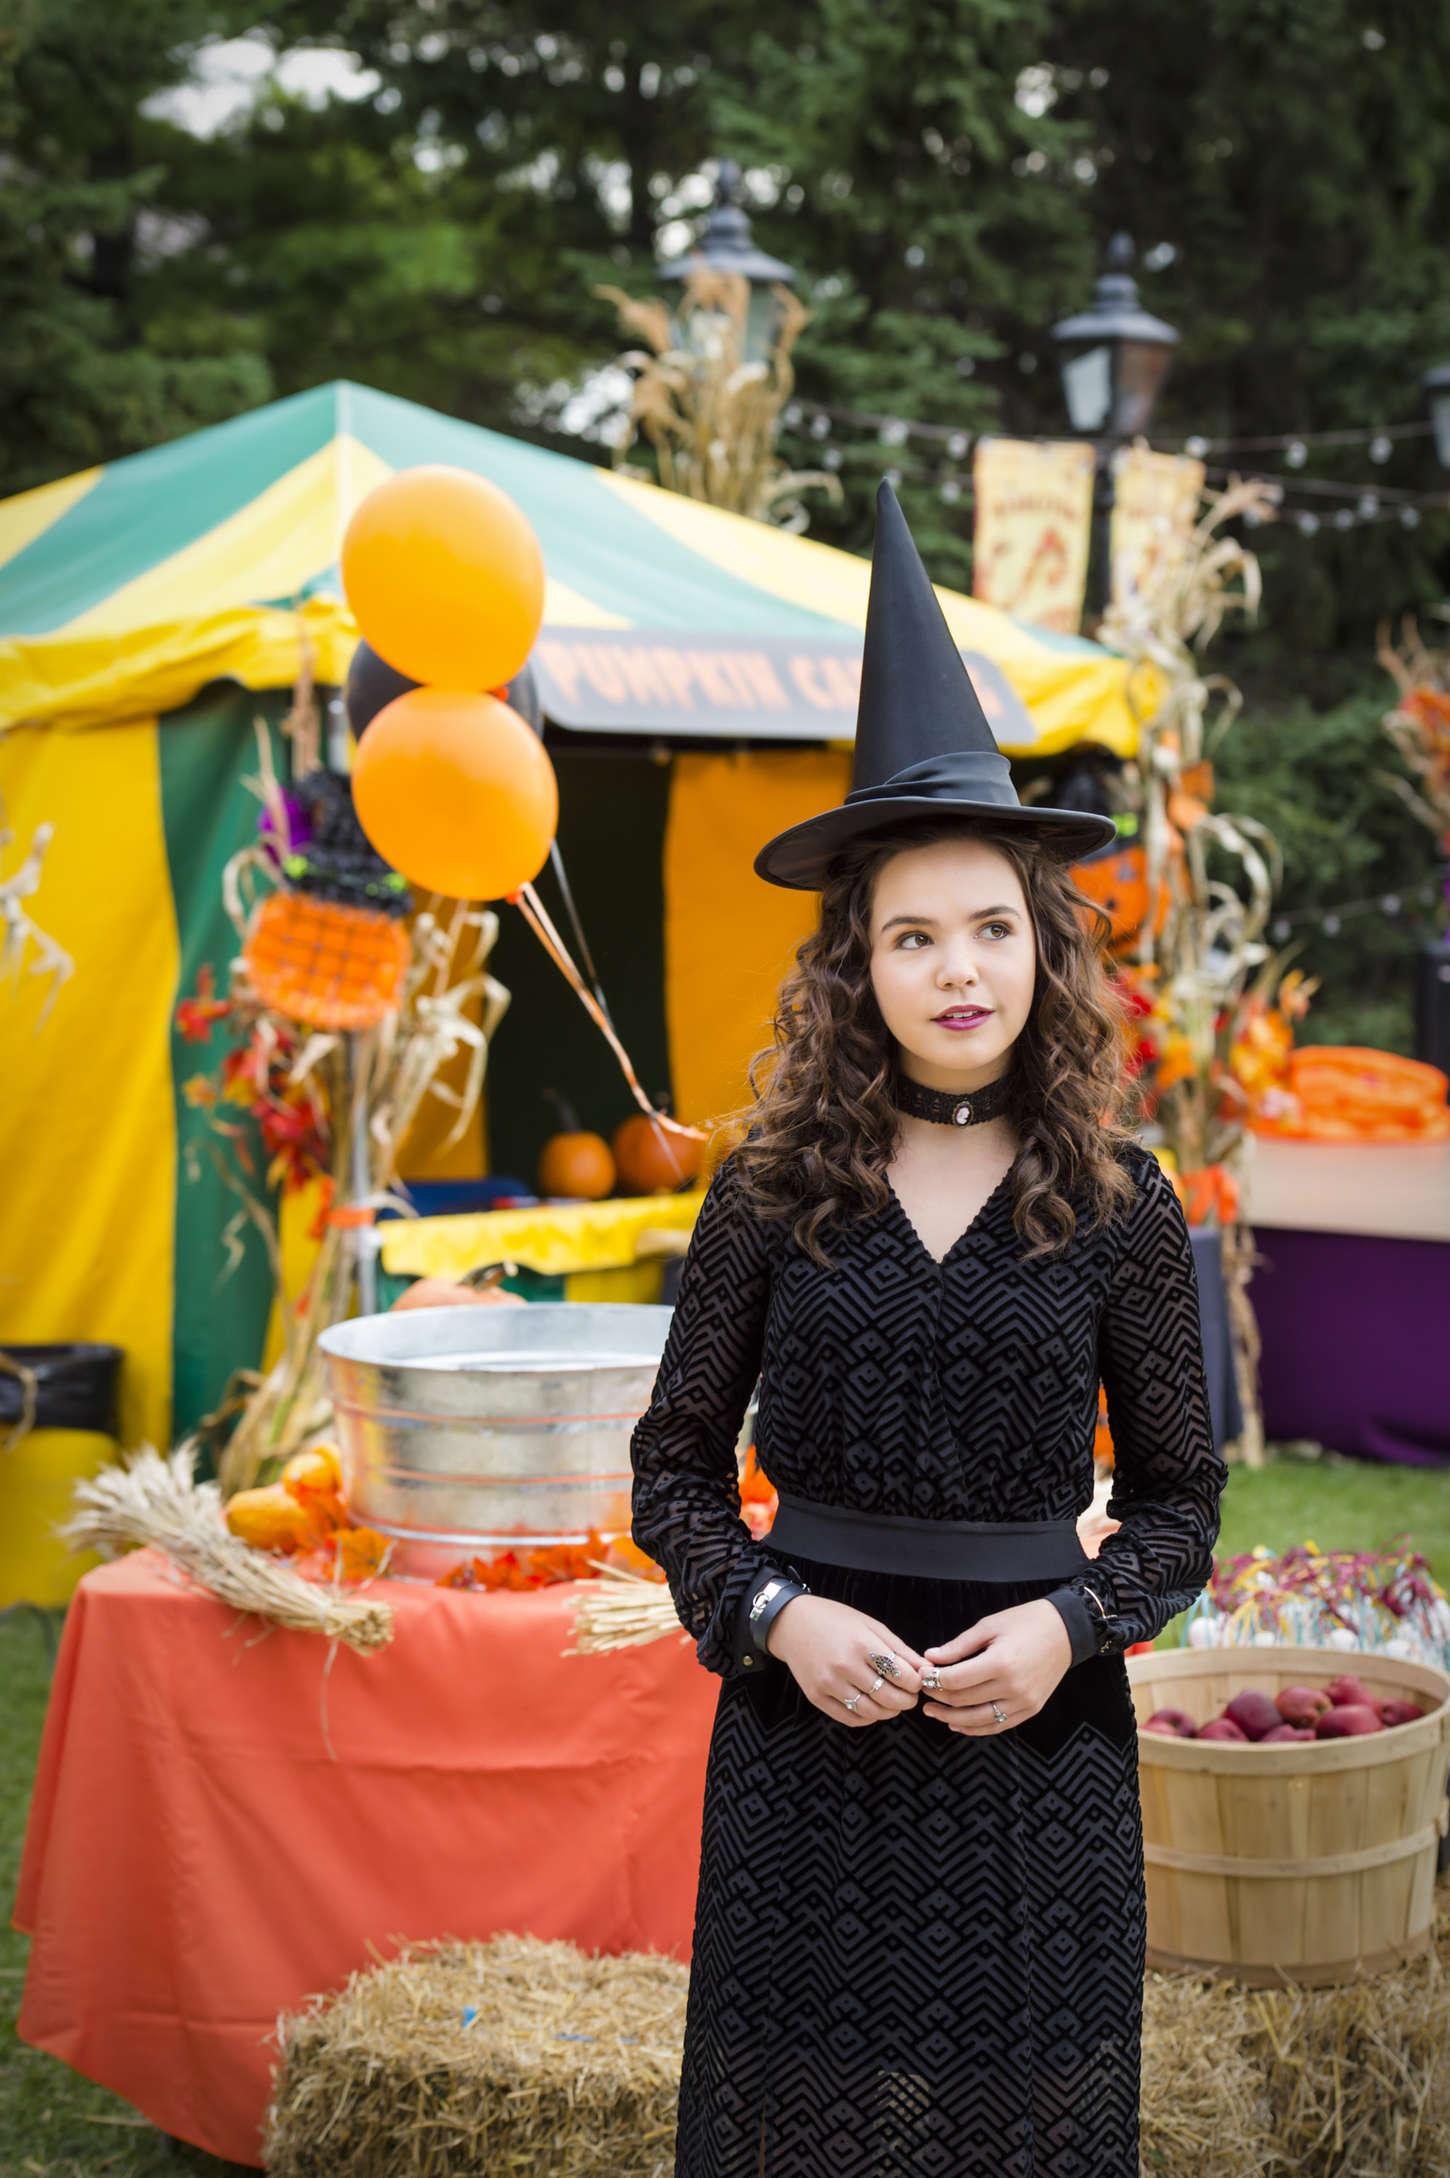 Bailee Madison 2015 : ailee Madison: Good Witch Season 2 Halloween Special Promos Stills -03